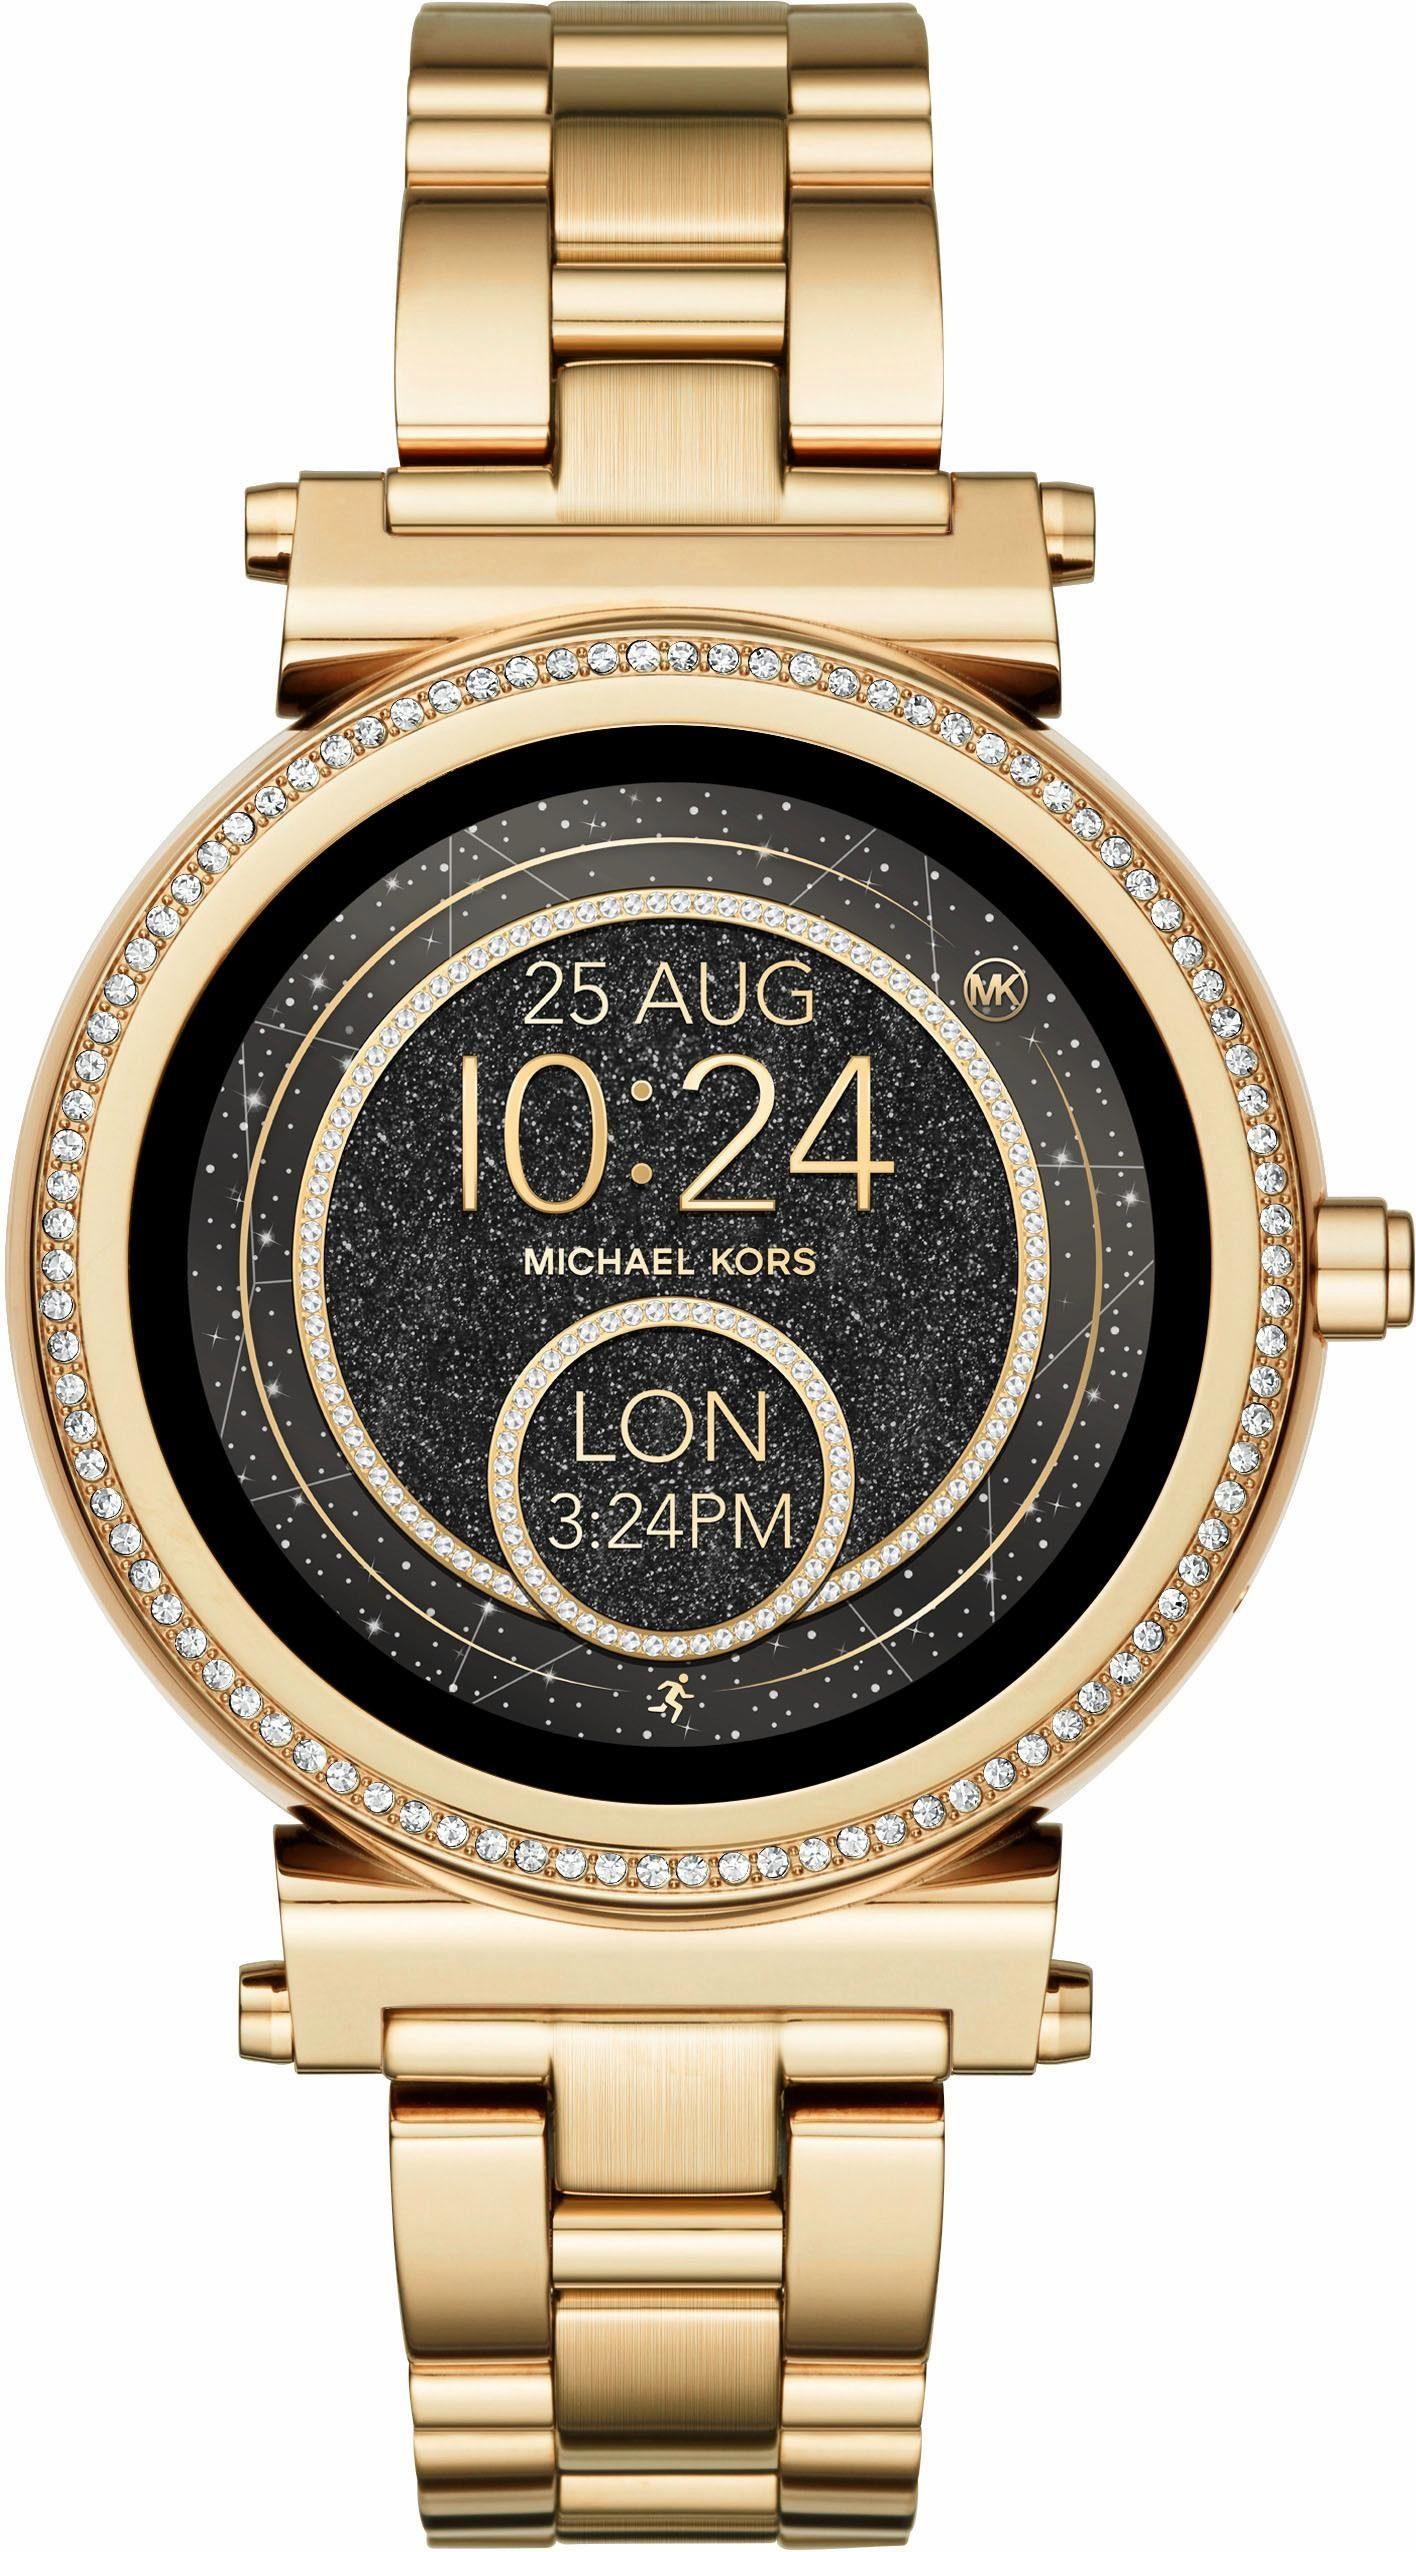 MICHAEL KORS ACCESS SOFIE, MKT5021 Smartwatch (Android Wear, inkl. Dornschließe für Wechselband)